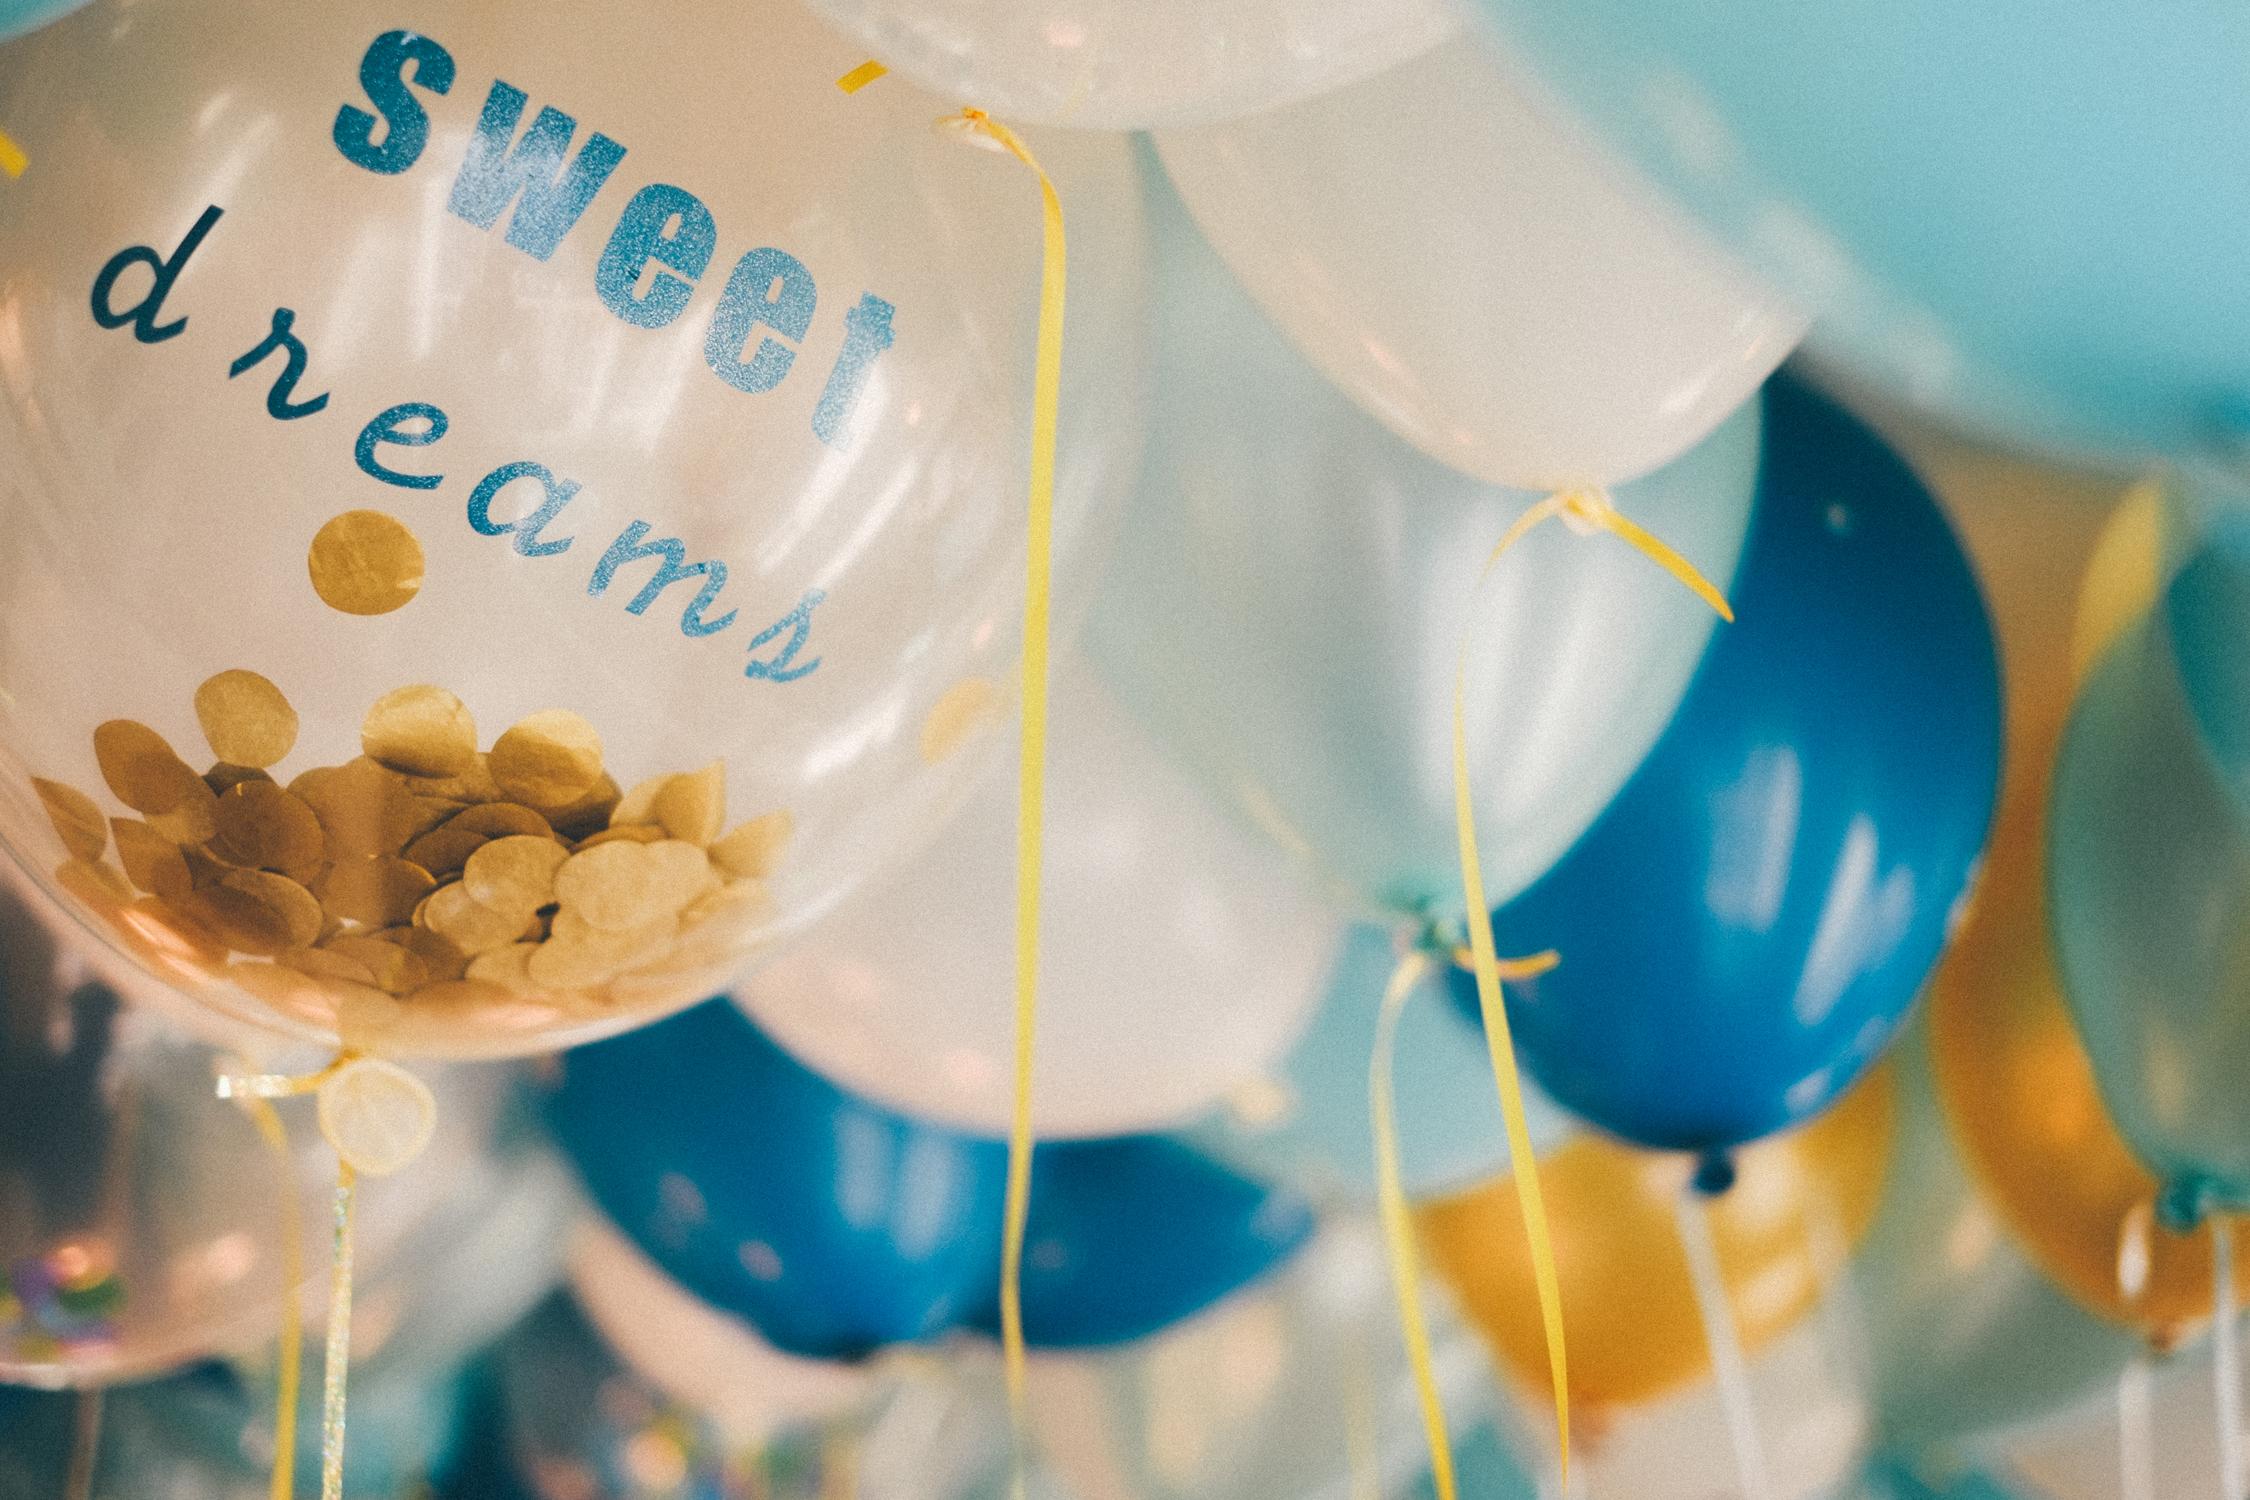 tarynco-sleepover-party-balloons (1).jpg